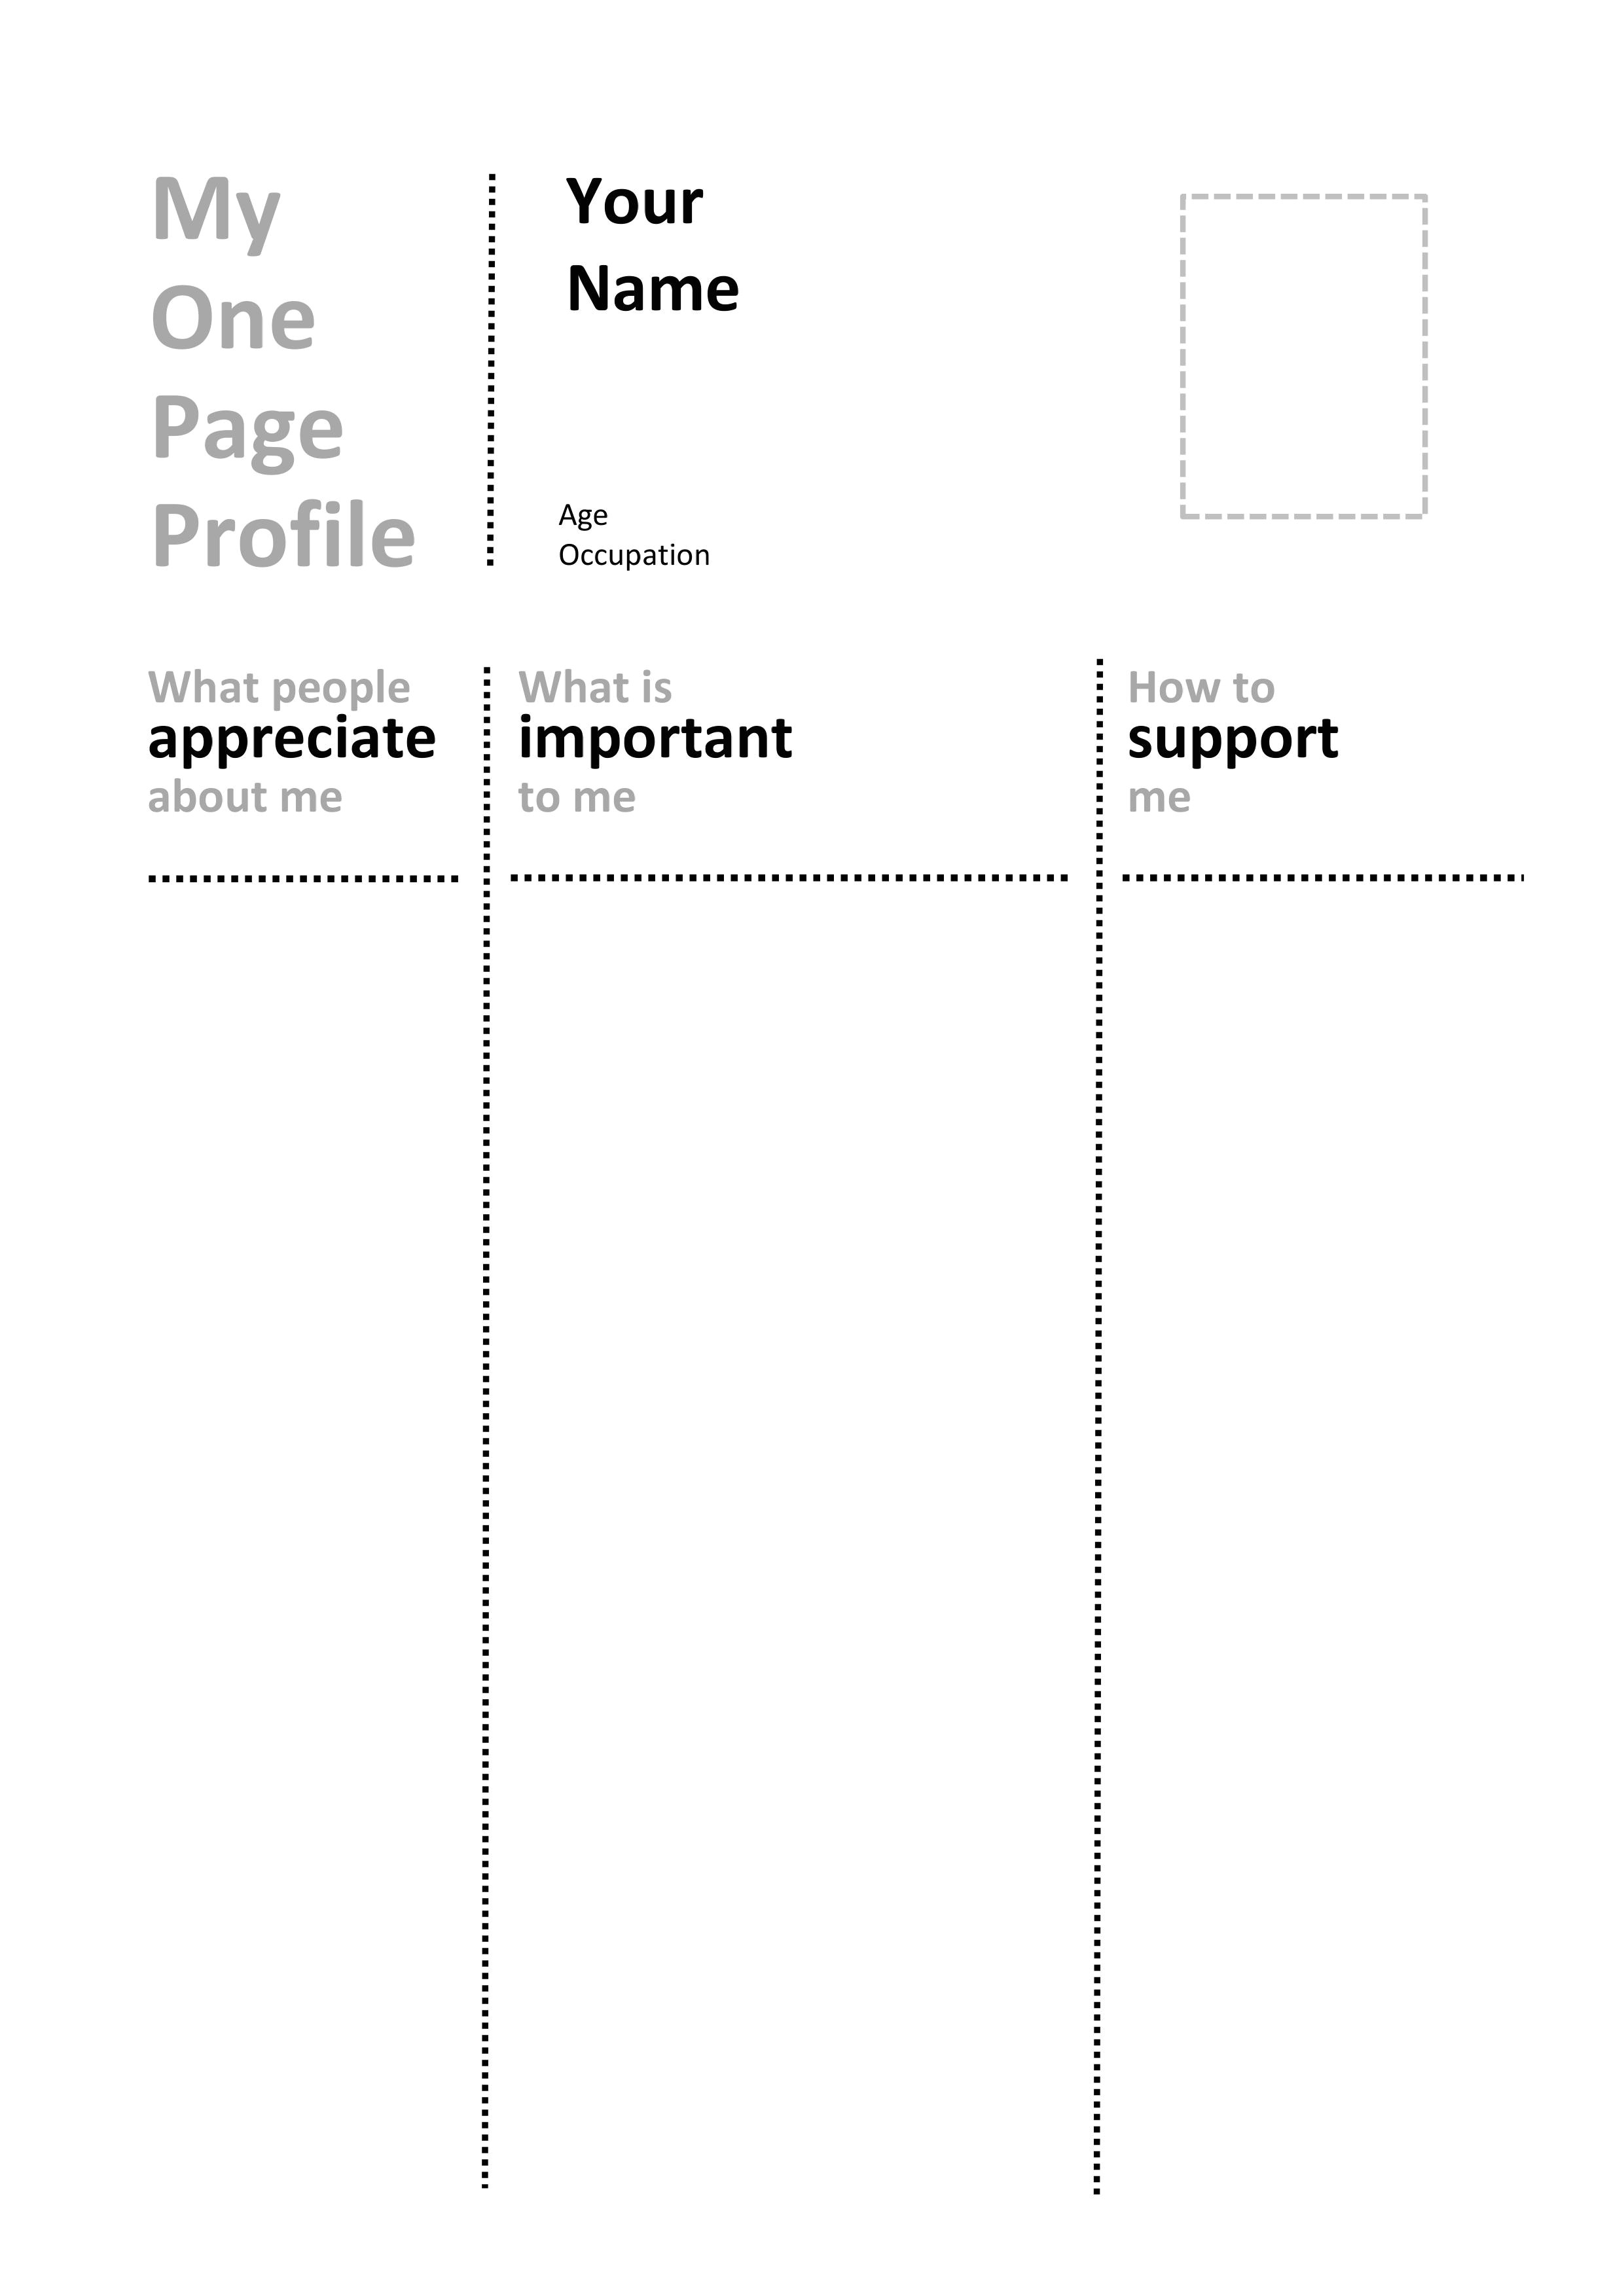 Communication Profile Template One Page Profile Templates Helen Sanderson associates